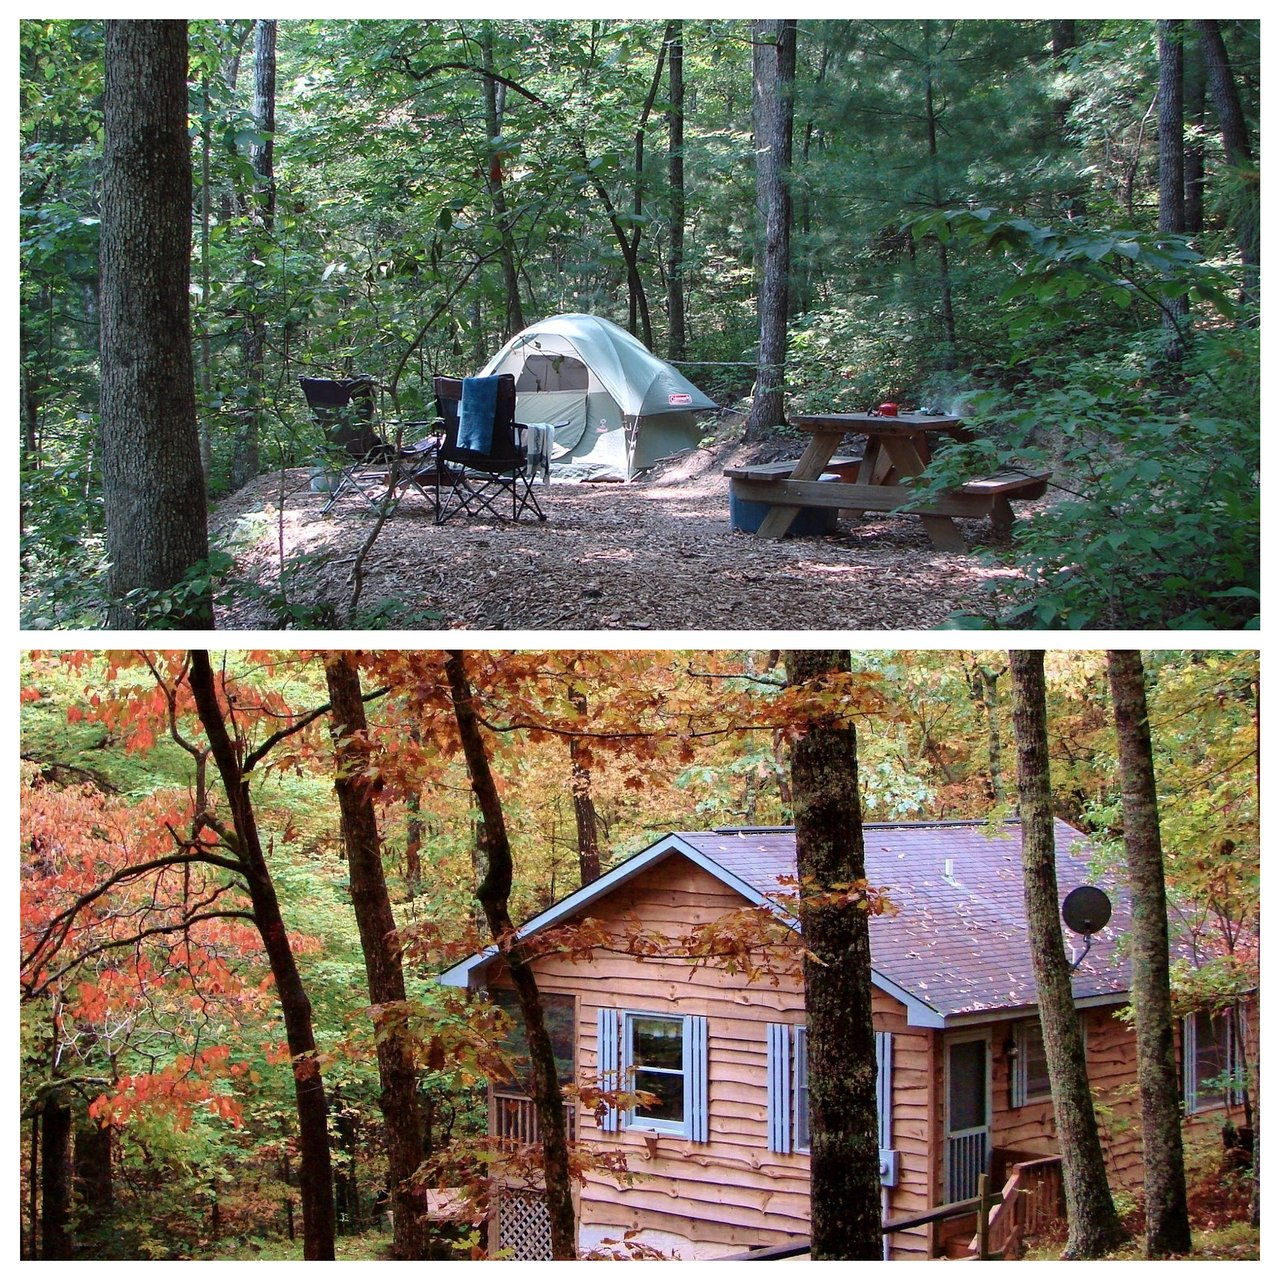 ash grove mountain cabins camping updated 2019 prices rh tripadvisor com